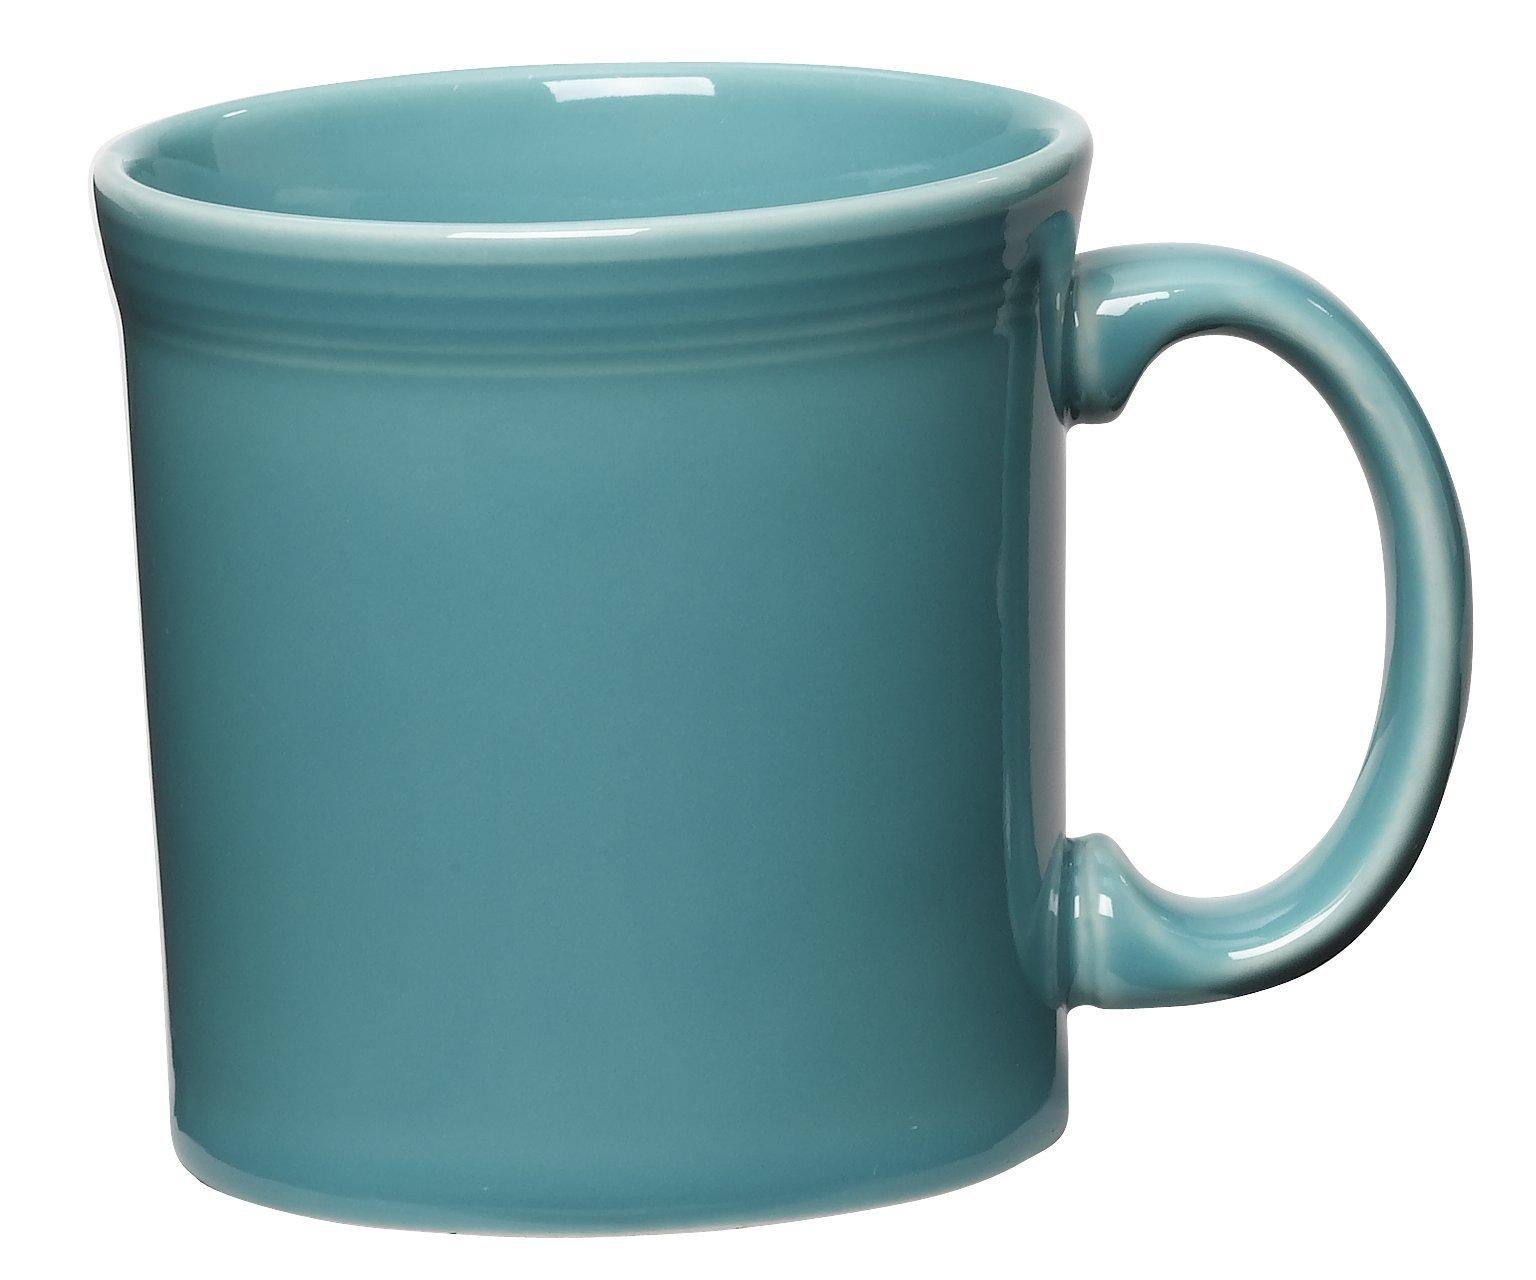 Fiesta 12-Ounce Java Mug, Turquoise